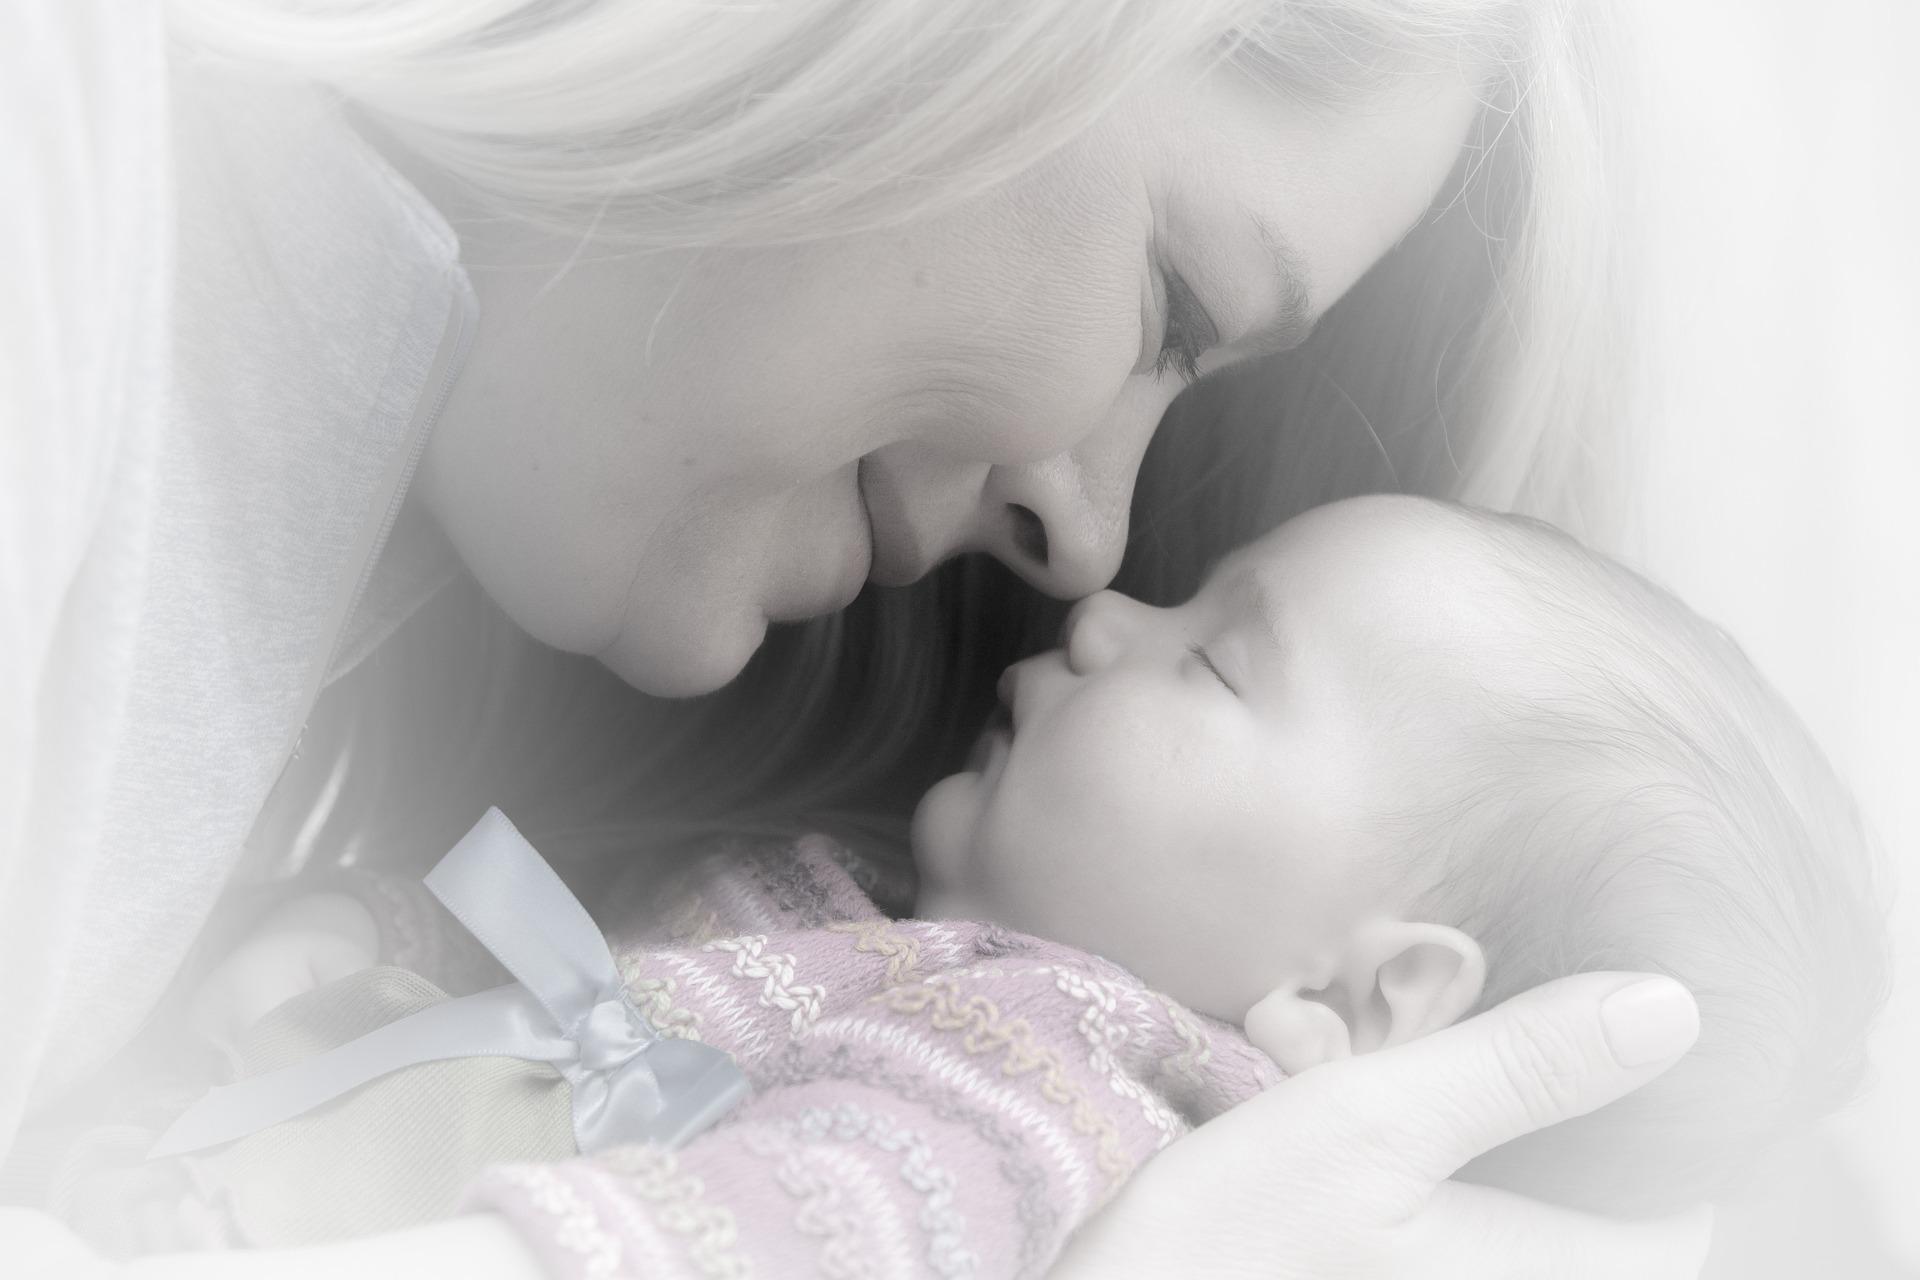 newborn-659685_1920-2